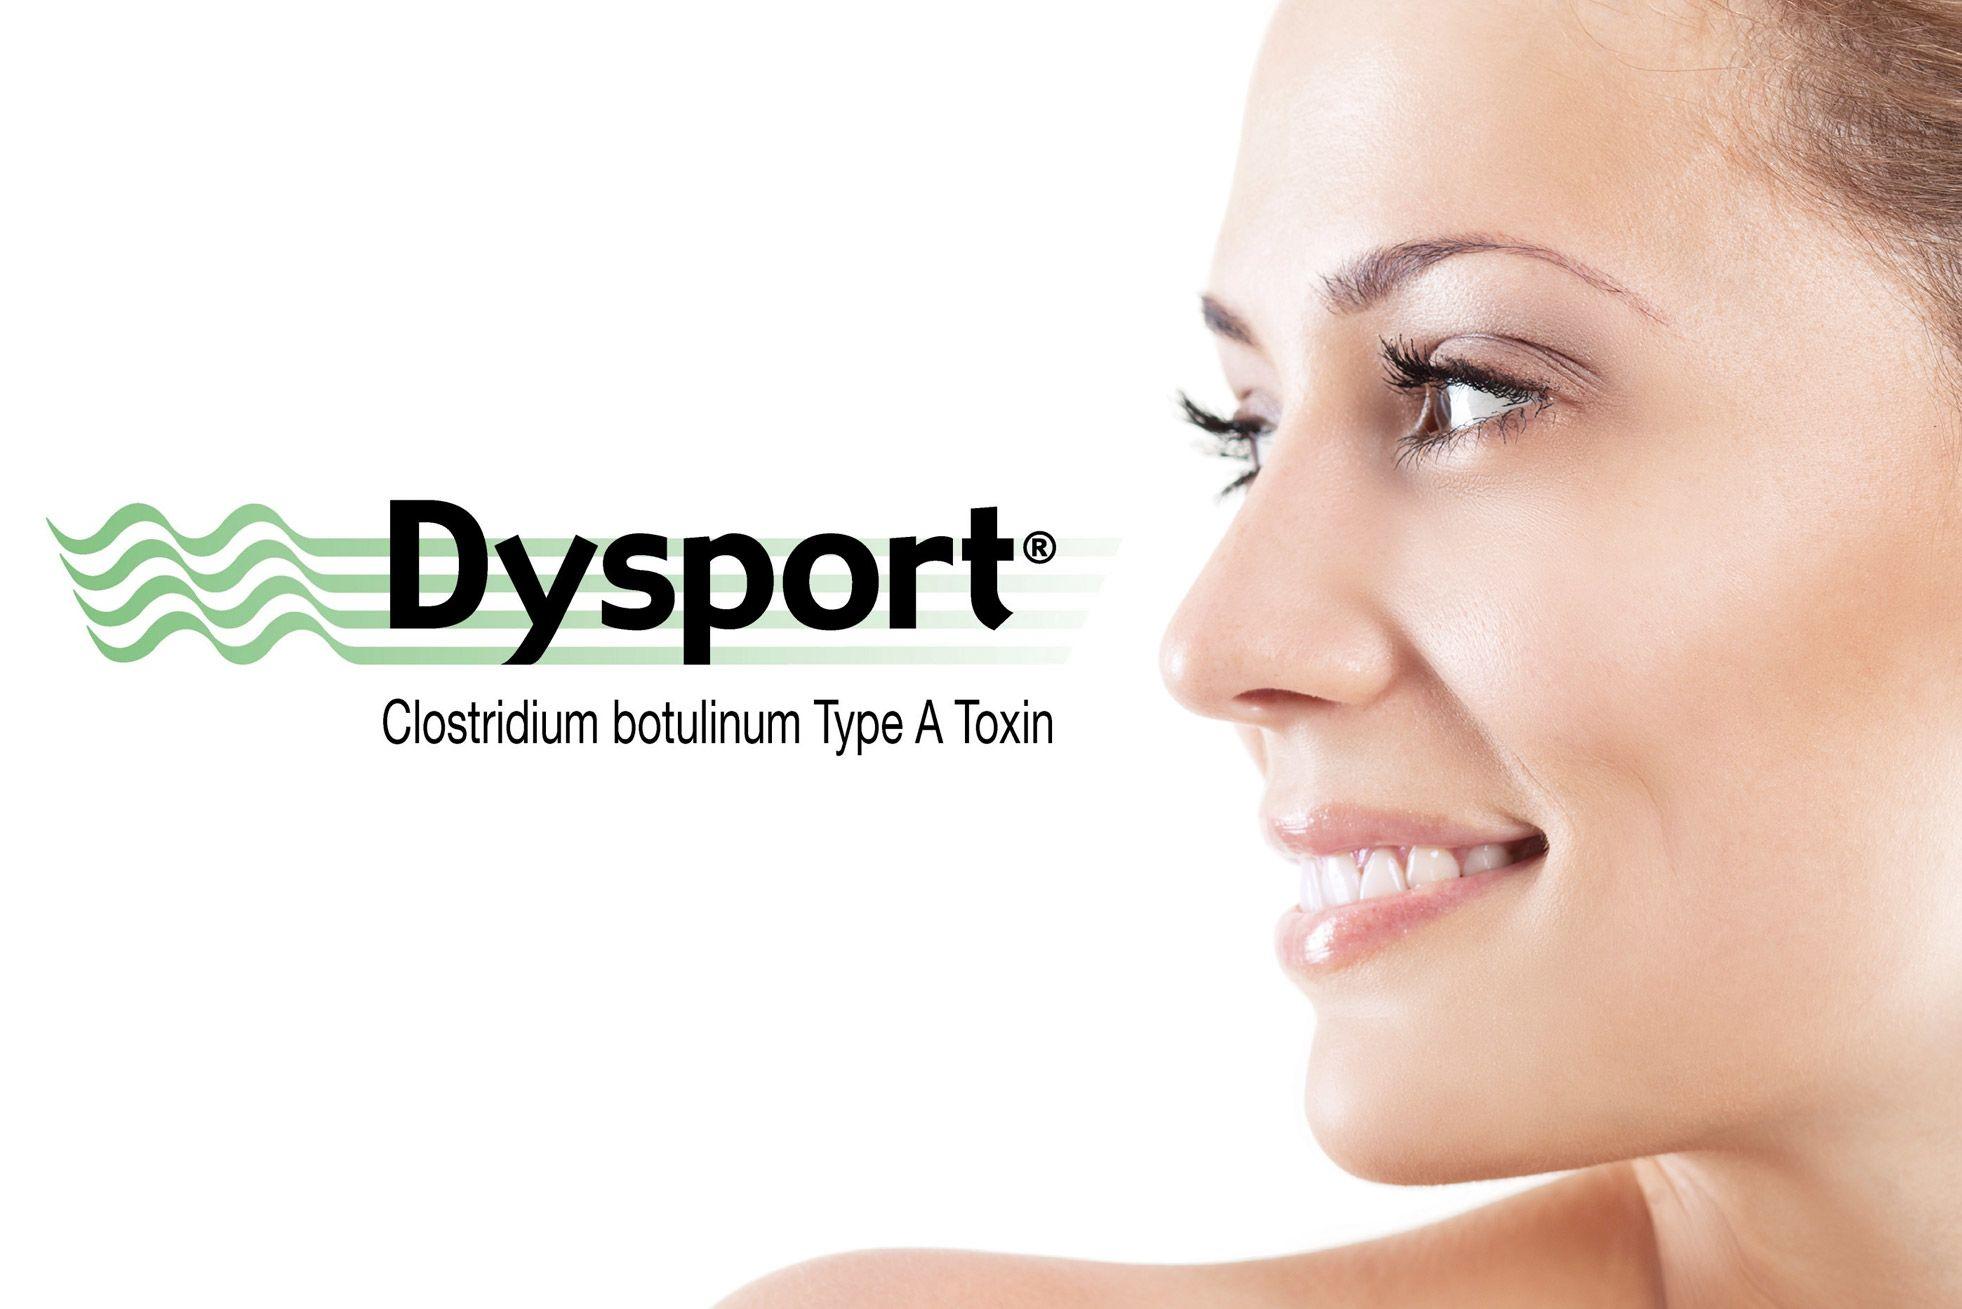 dysport3.jpg